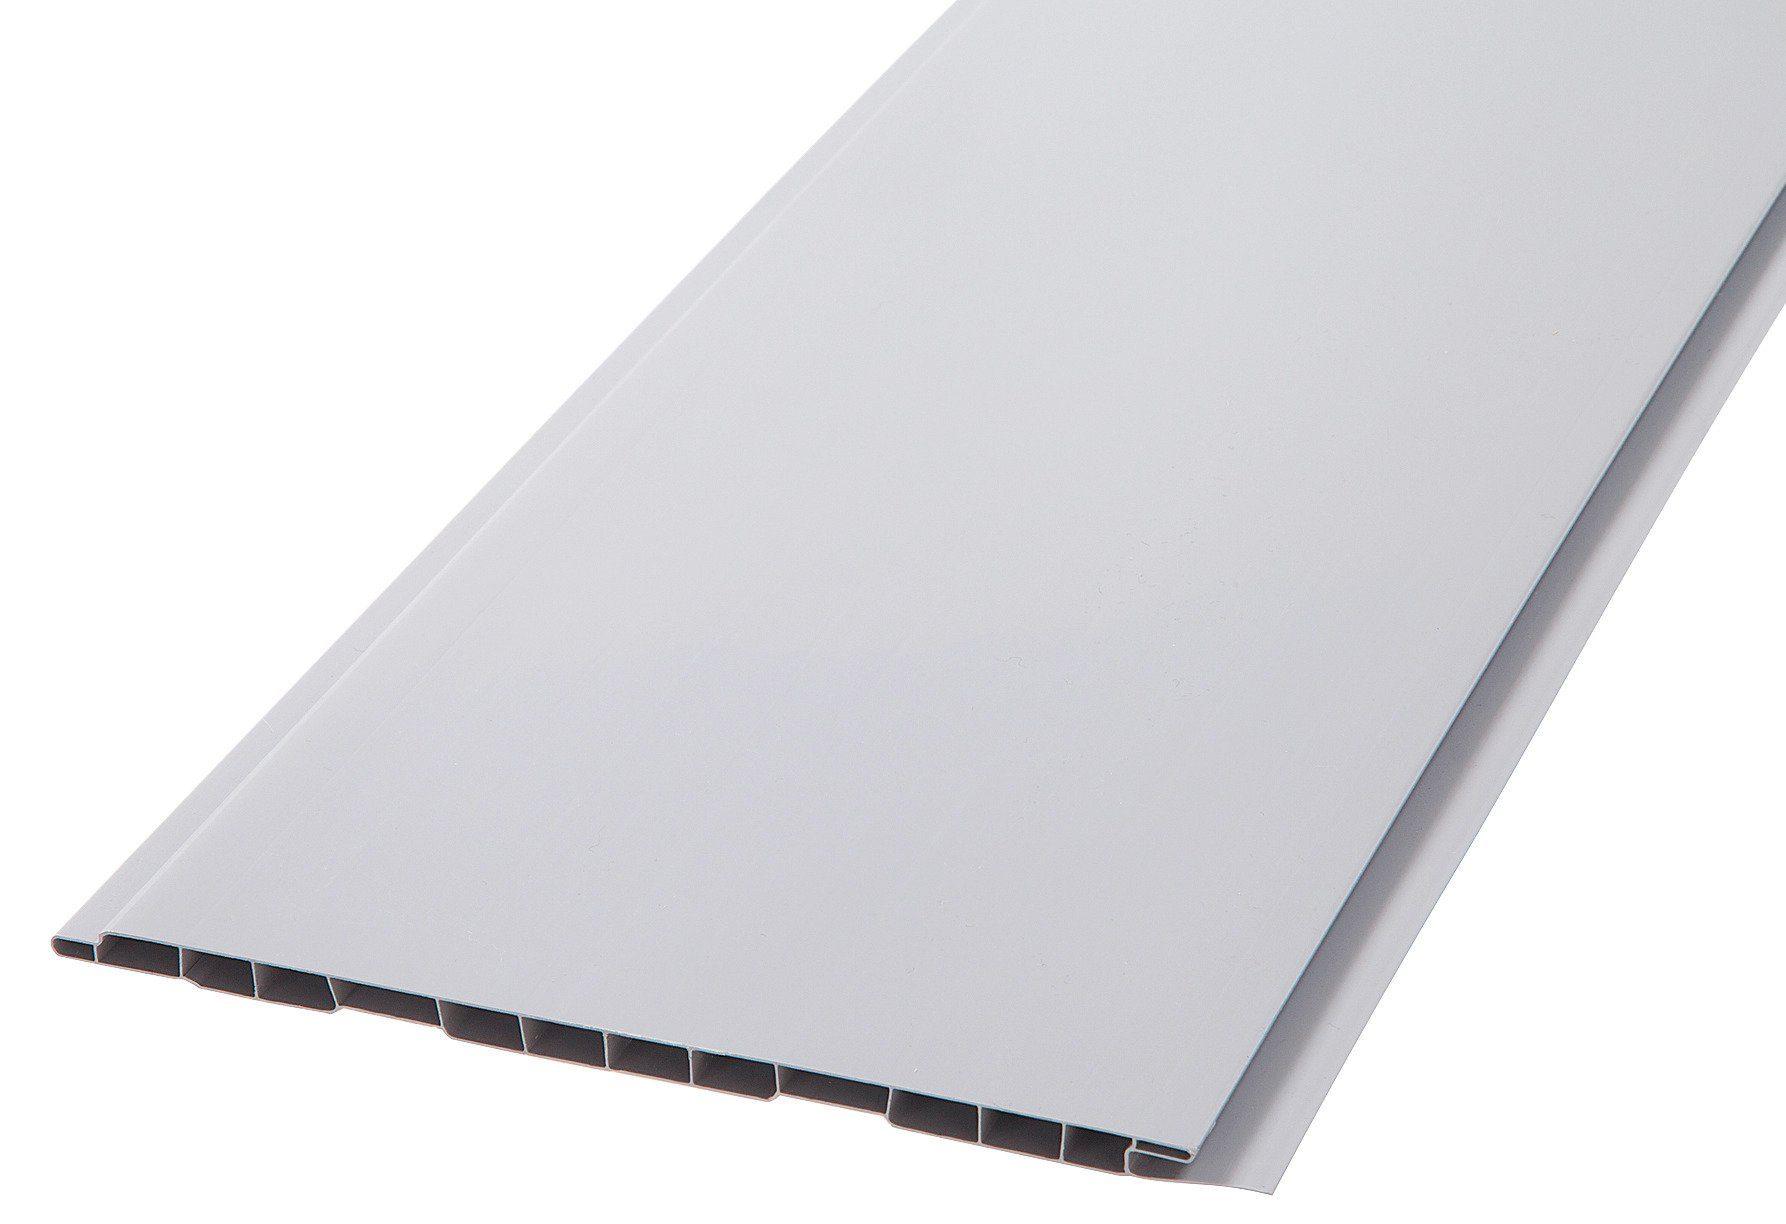 Baukulit Spar-Set: Verkleidungspaneele B 20 glatt Profiline, 8,1 m²